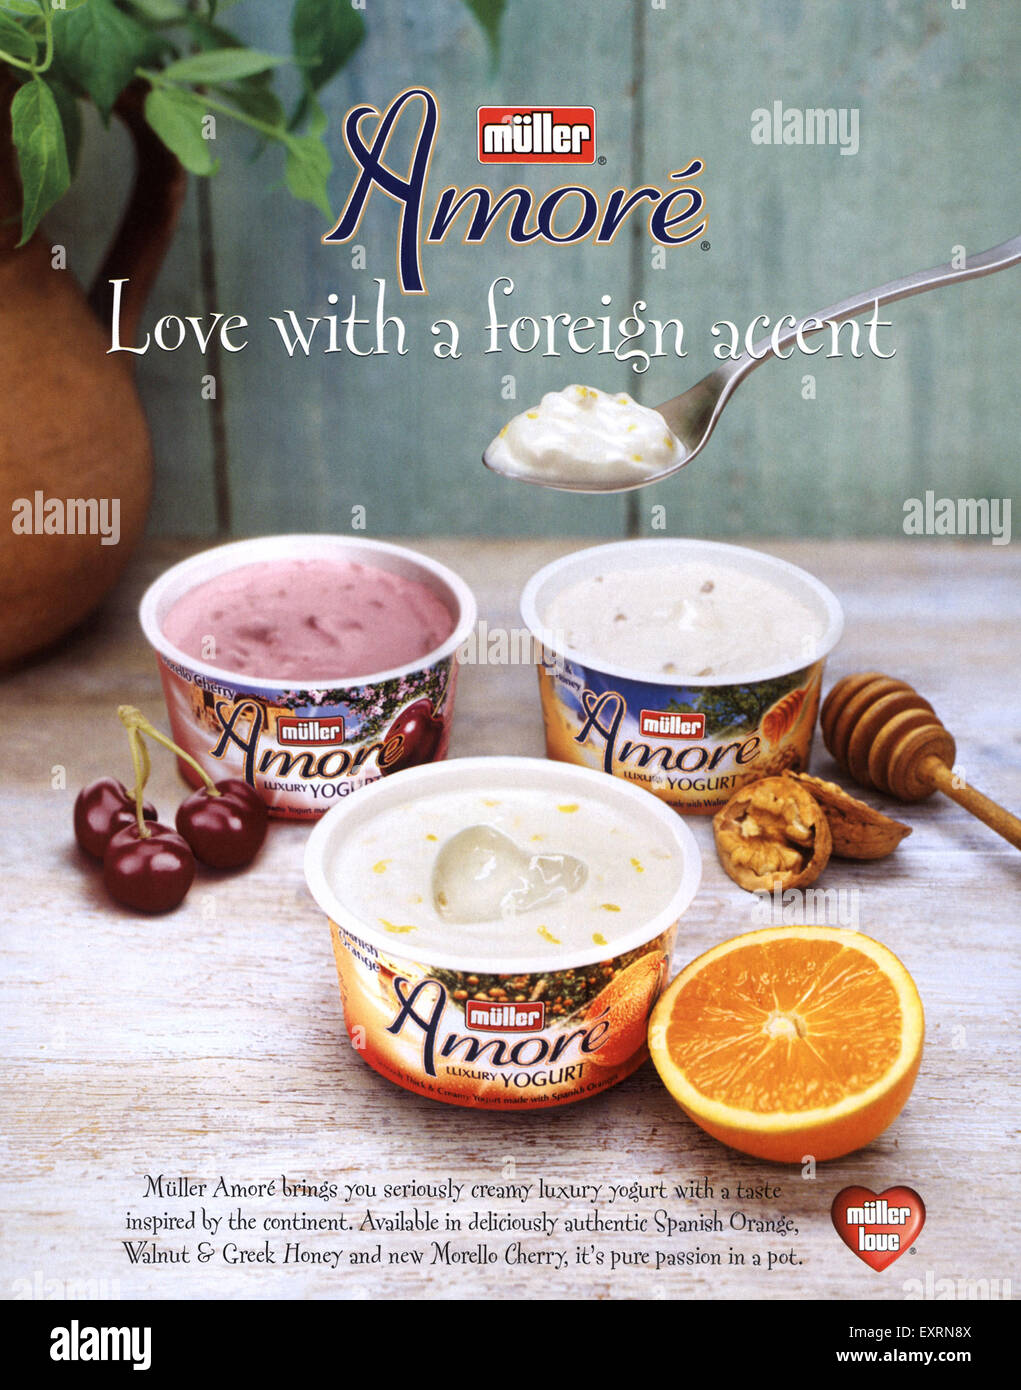 2000s UK Muller Amore Magazine Advert - Stock Image